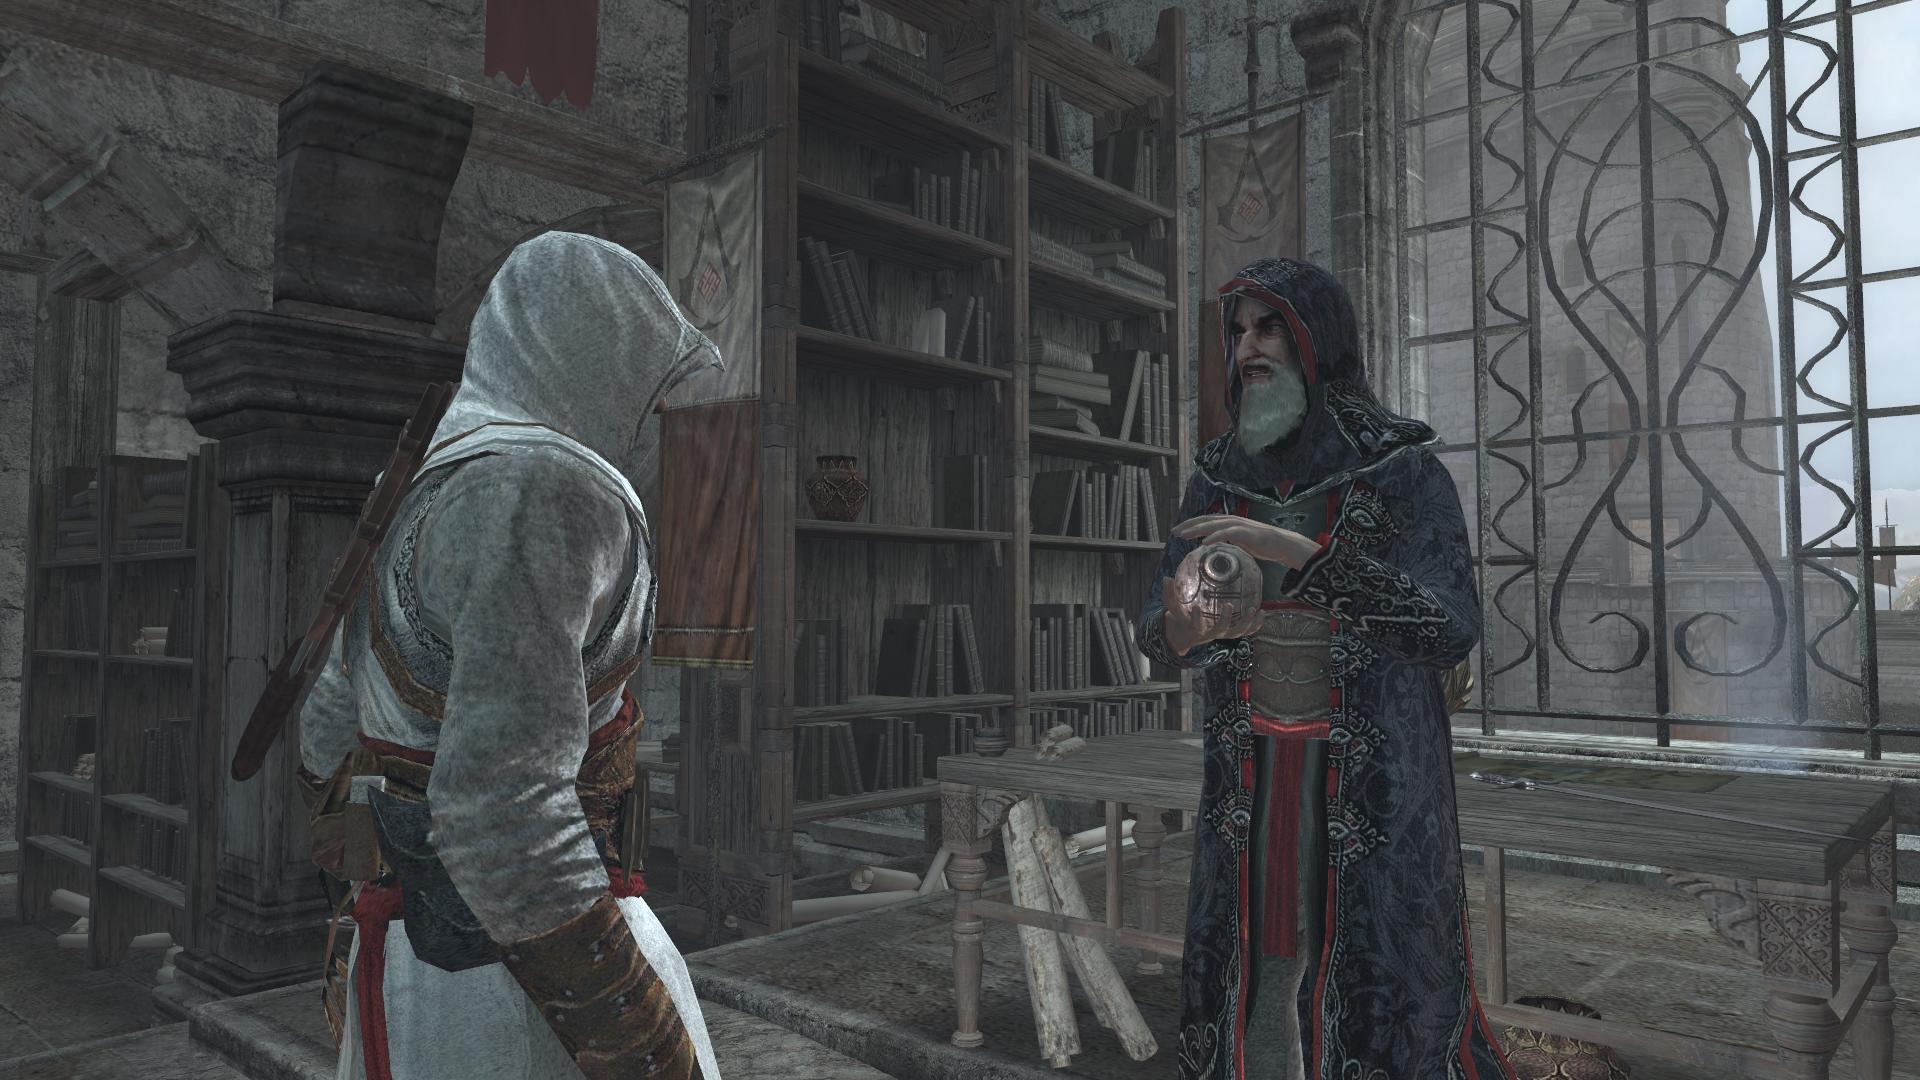 Assassin's Creed Overhaul 2016 - Al Mualim image - Mod DB